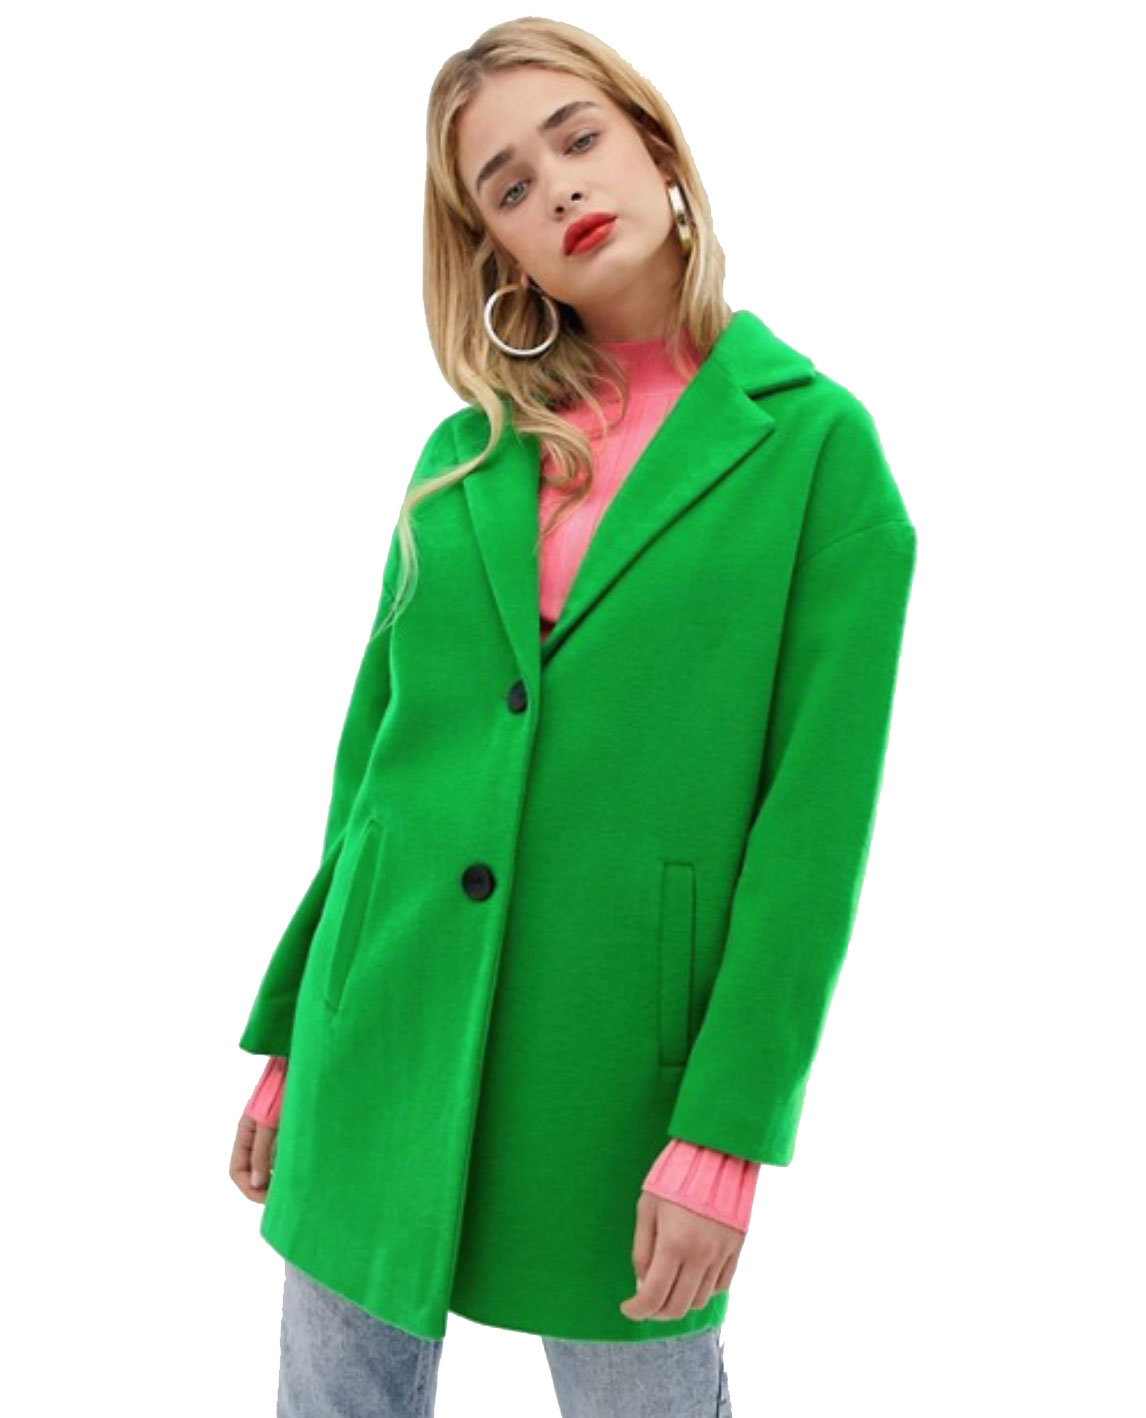 Stradivarius Neon Green Coat     $79